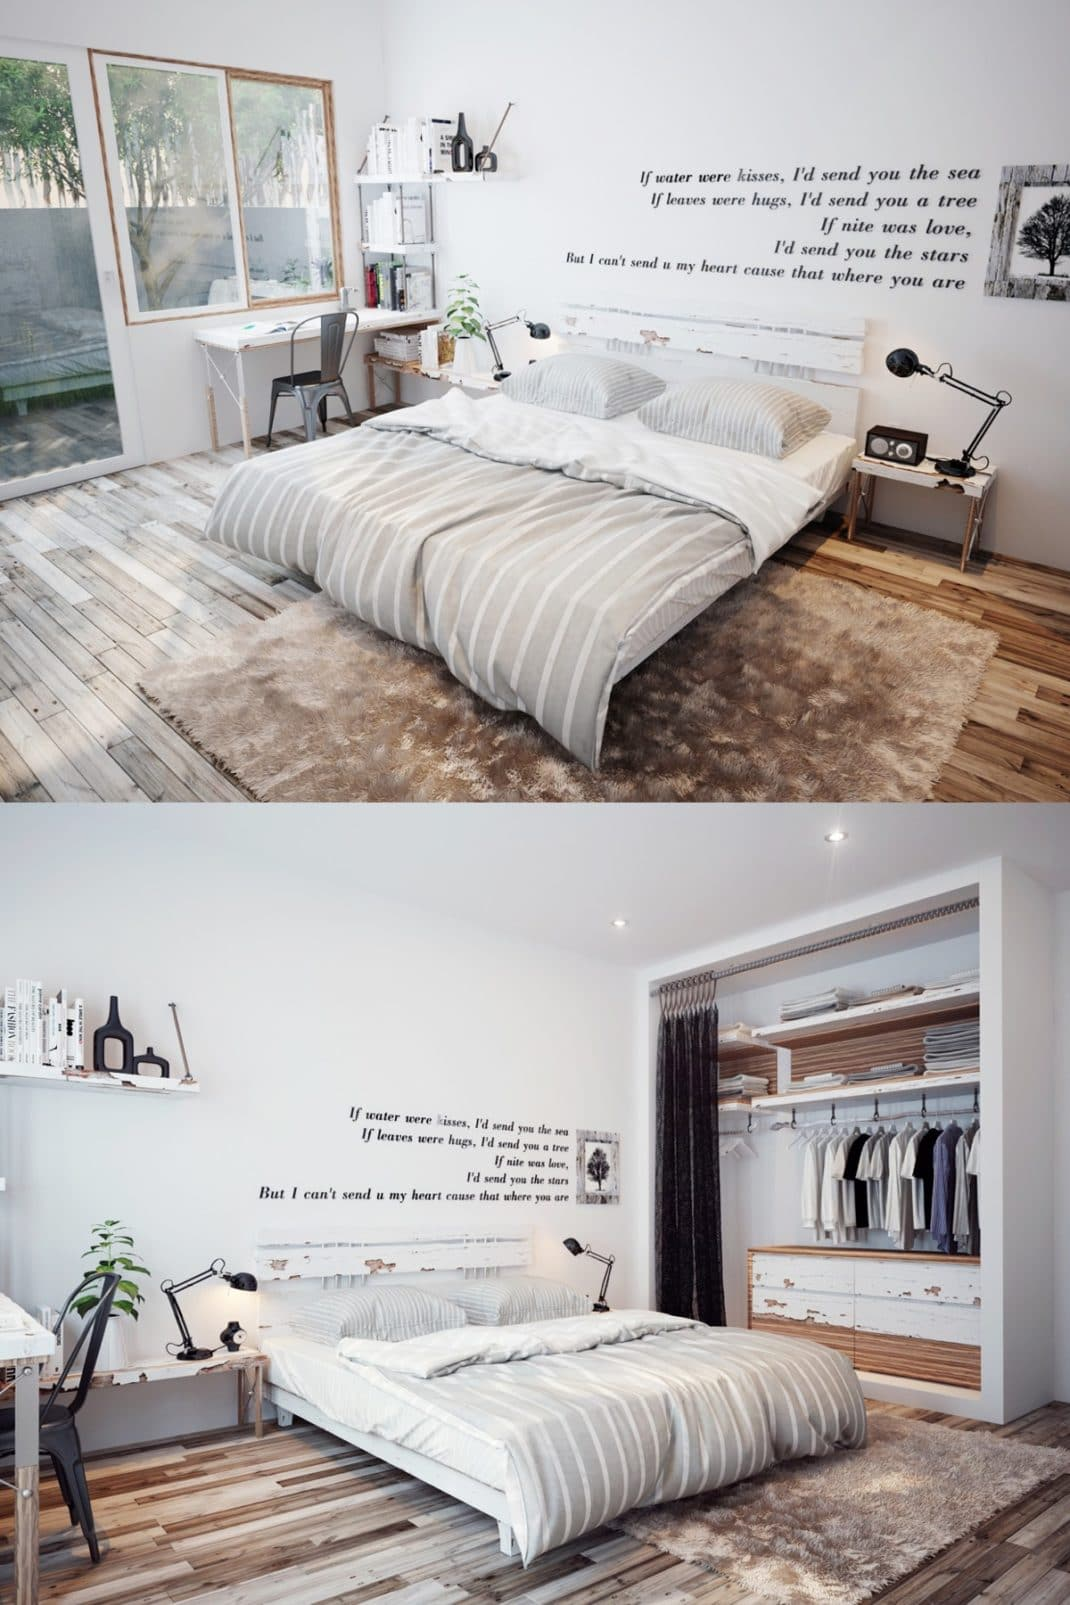 d coration de chambre scandinave id es et inspirations. Black Bedroom Furniture Sets. Home Design Ideas